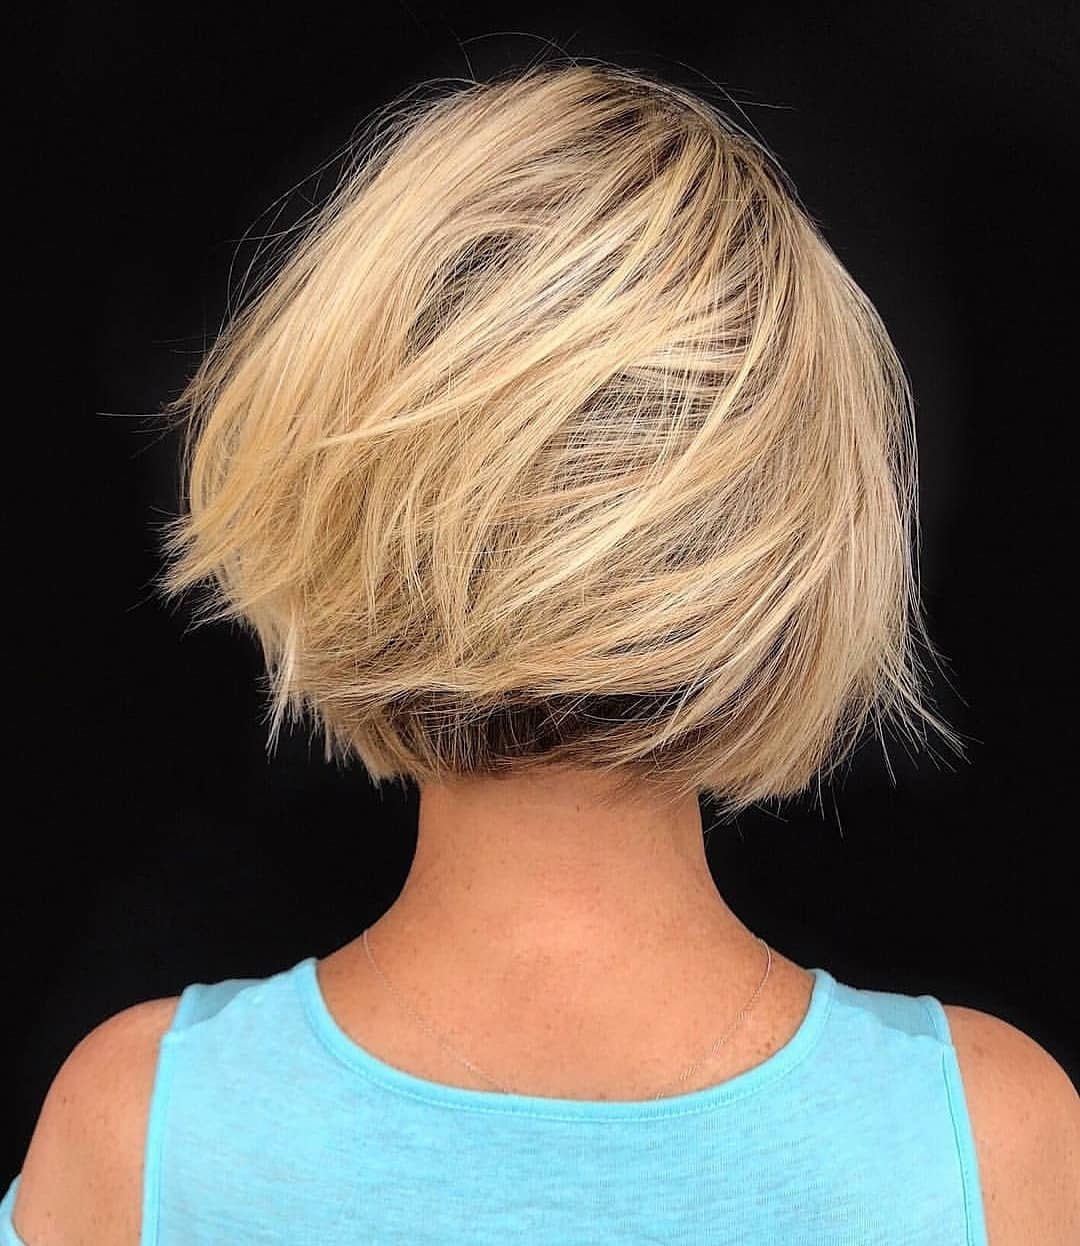 Top 10 Low Maintenance Short Bob Cuts For Thick Hair Short